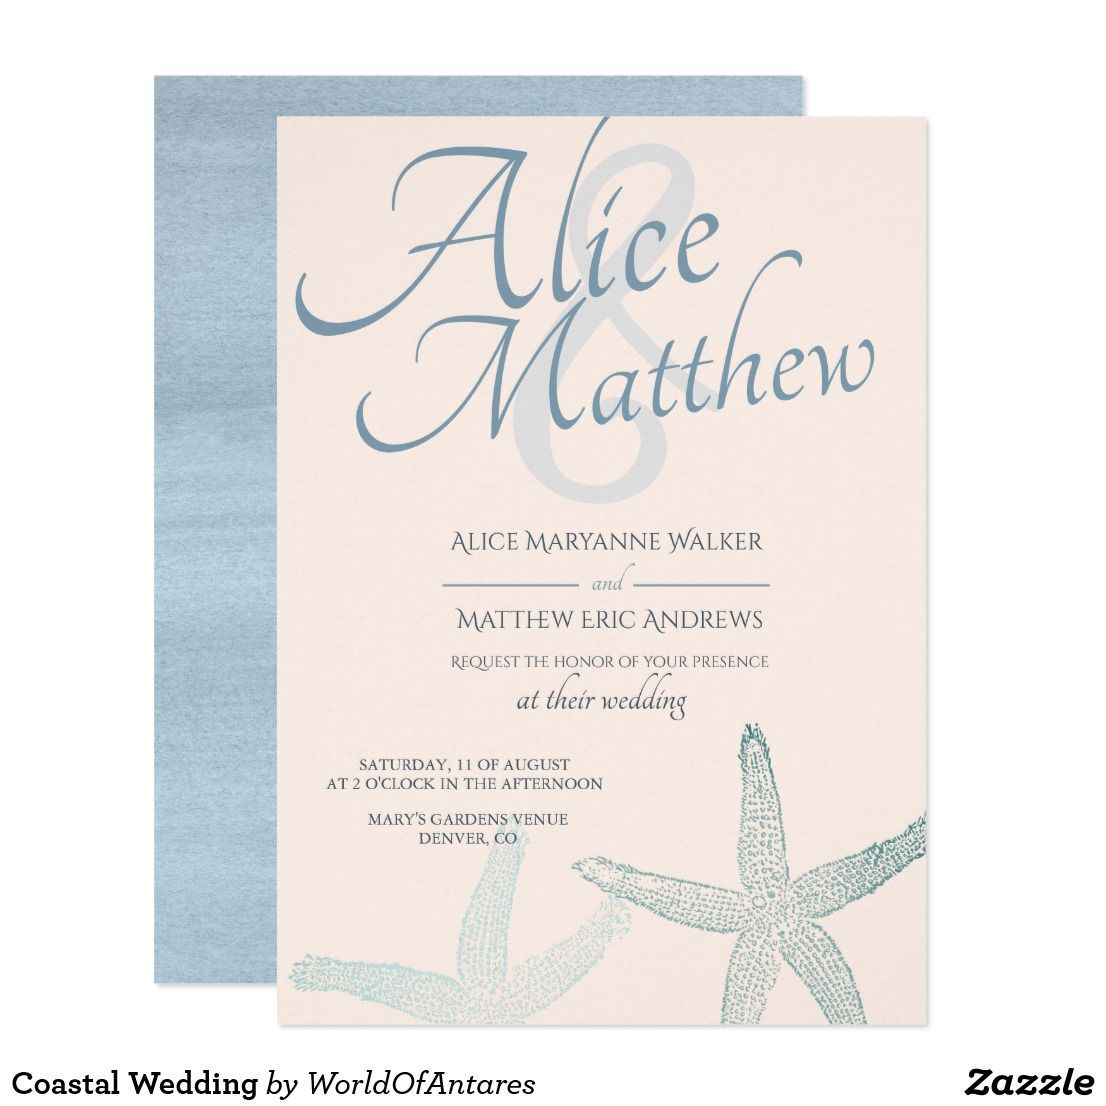 Stuffing Wedding Invitations Coastal Wedding Invitation Coastal Blue Blush Pink Starfish